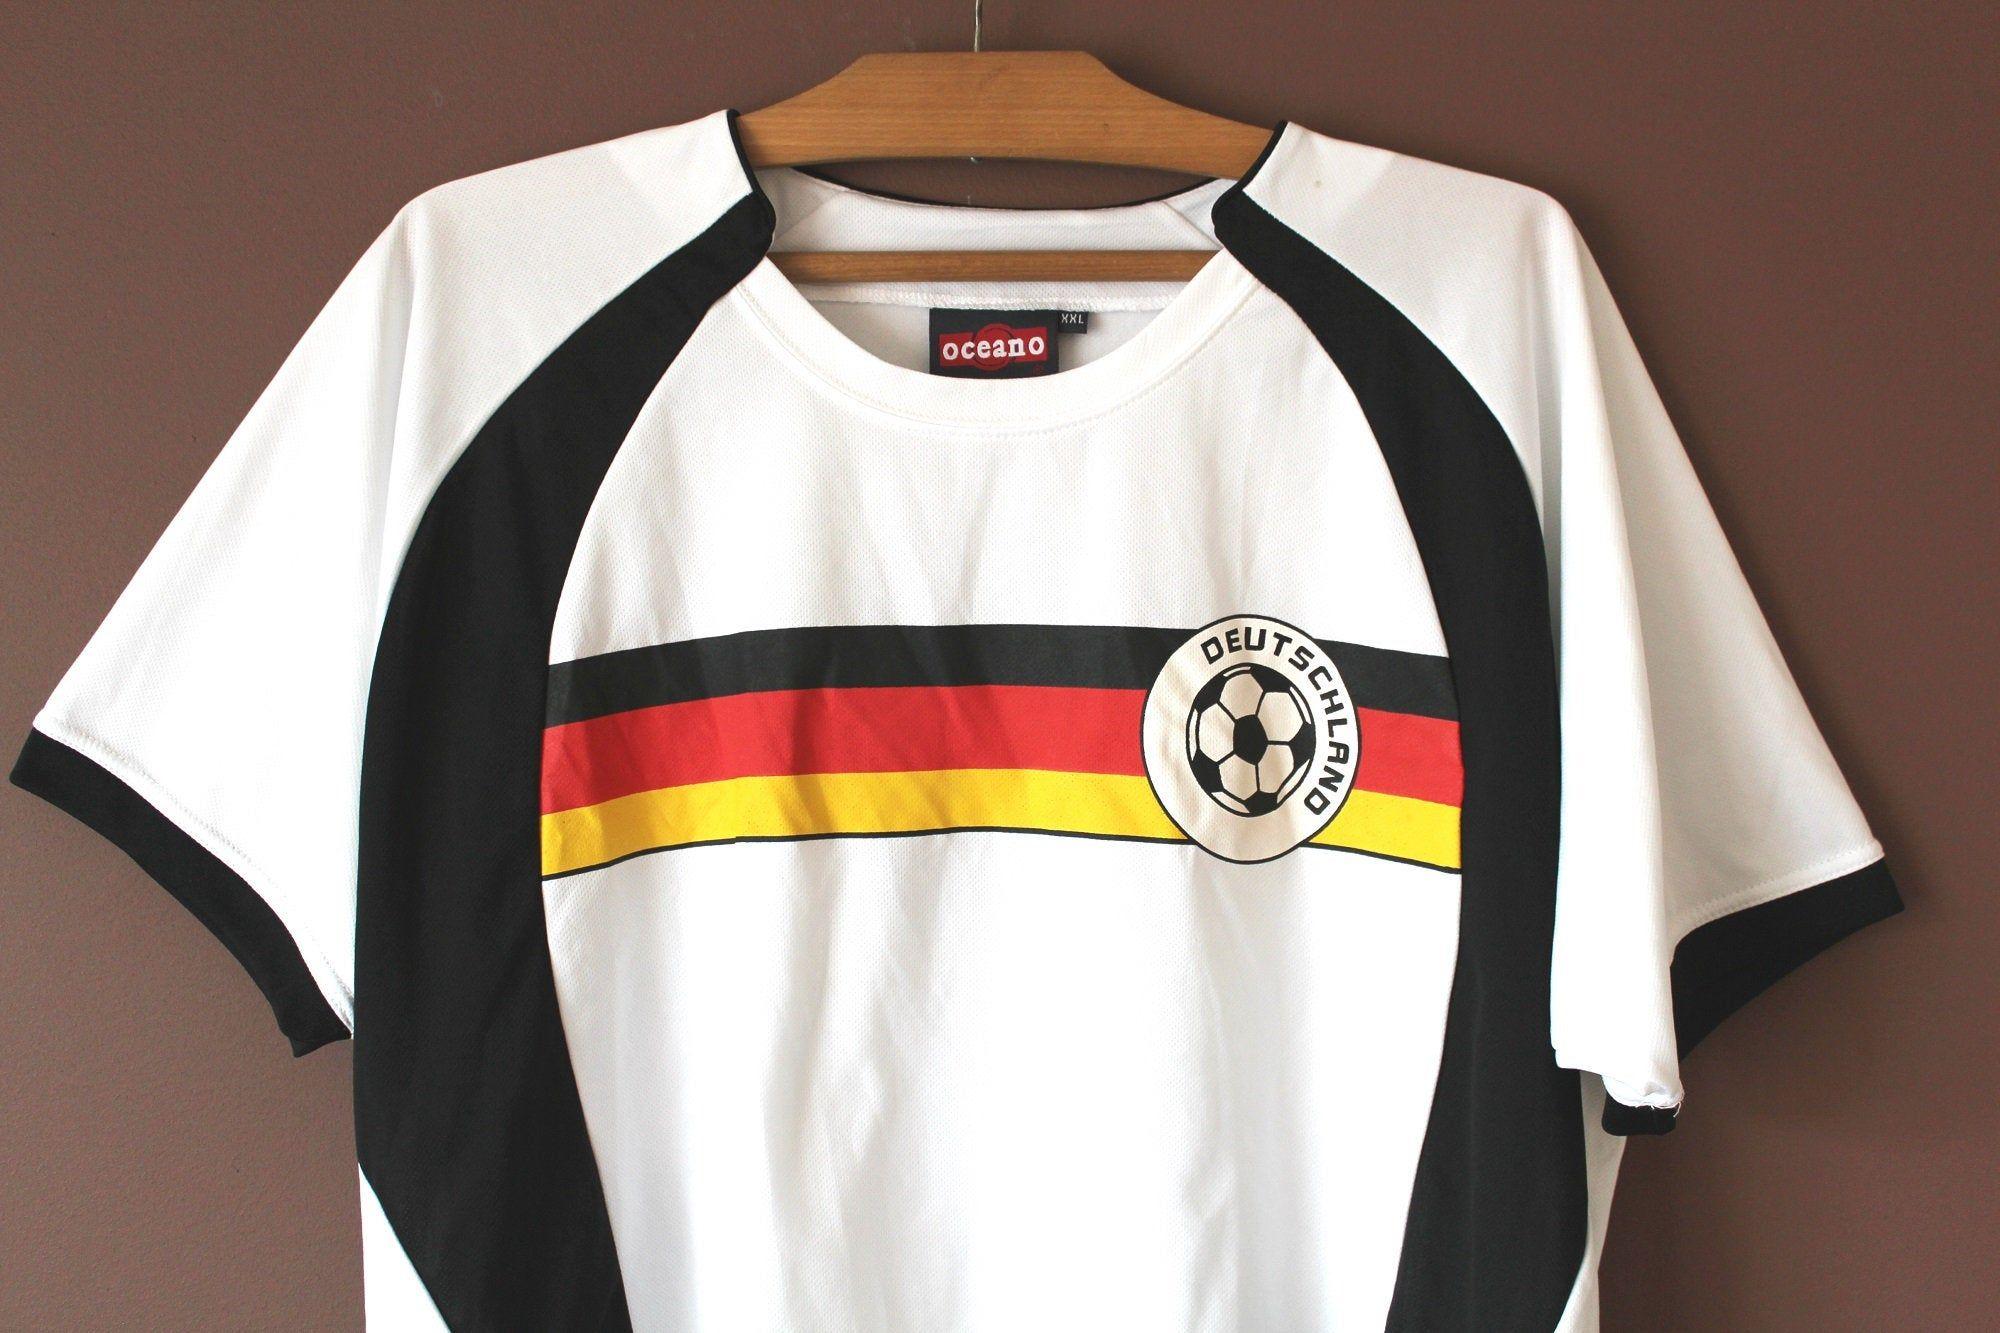 Deutschland Football Shirt Vintage German National Team Etsy Football Shirts Training Shirts Shirts [ 1333 x 2000 Pixel ]